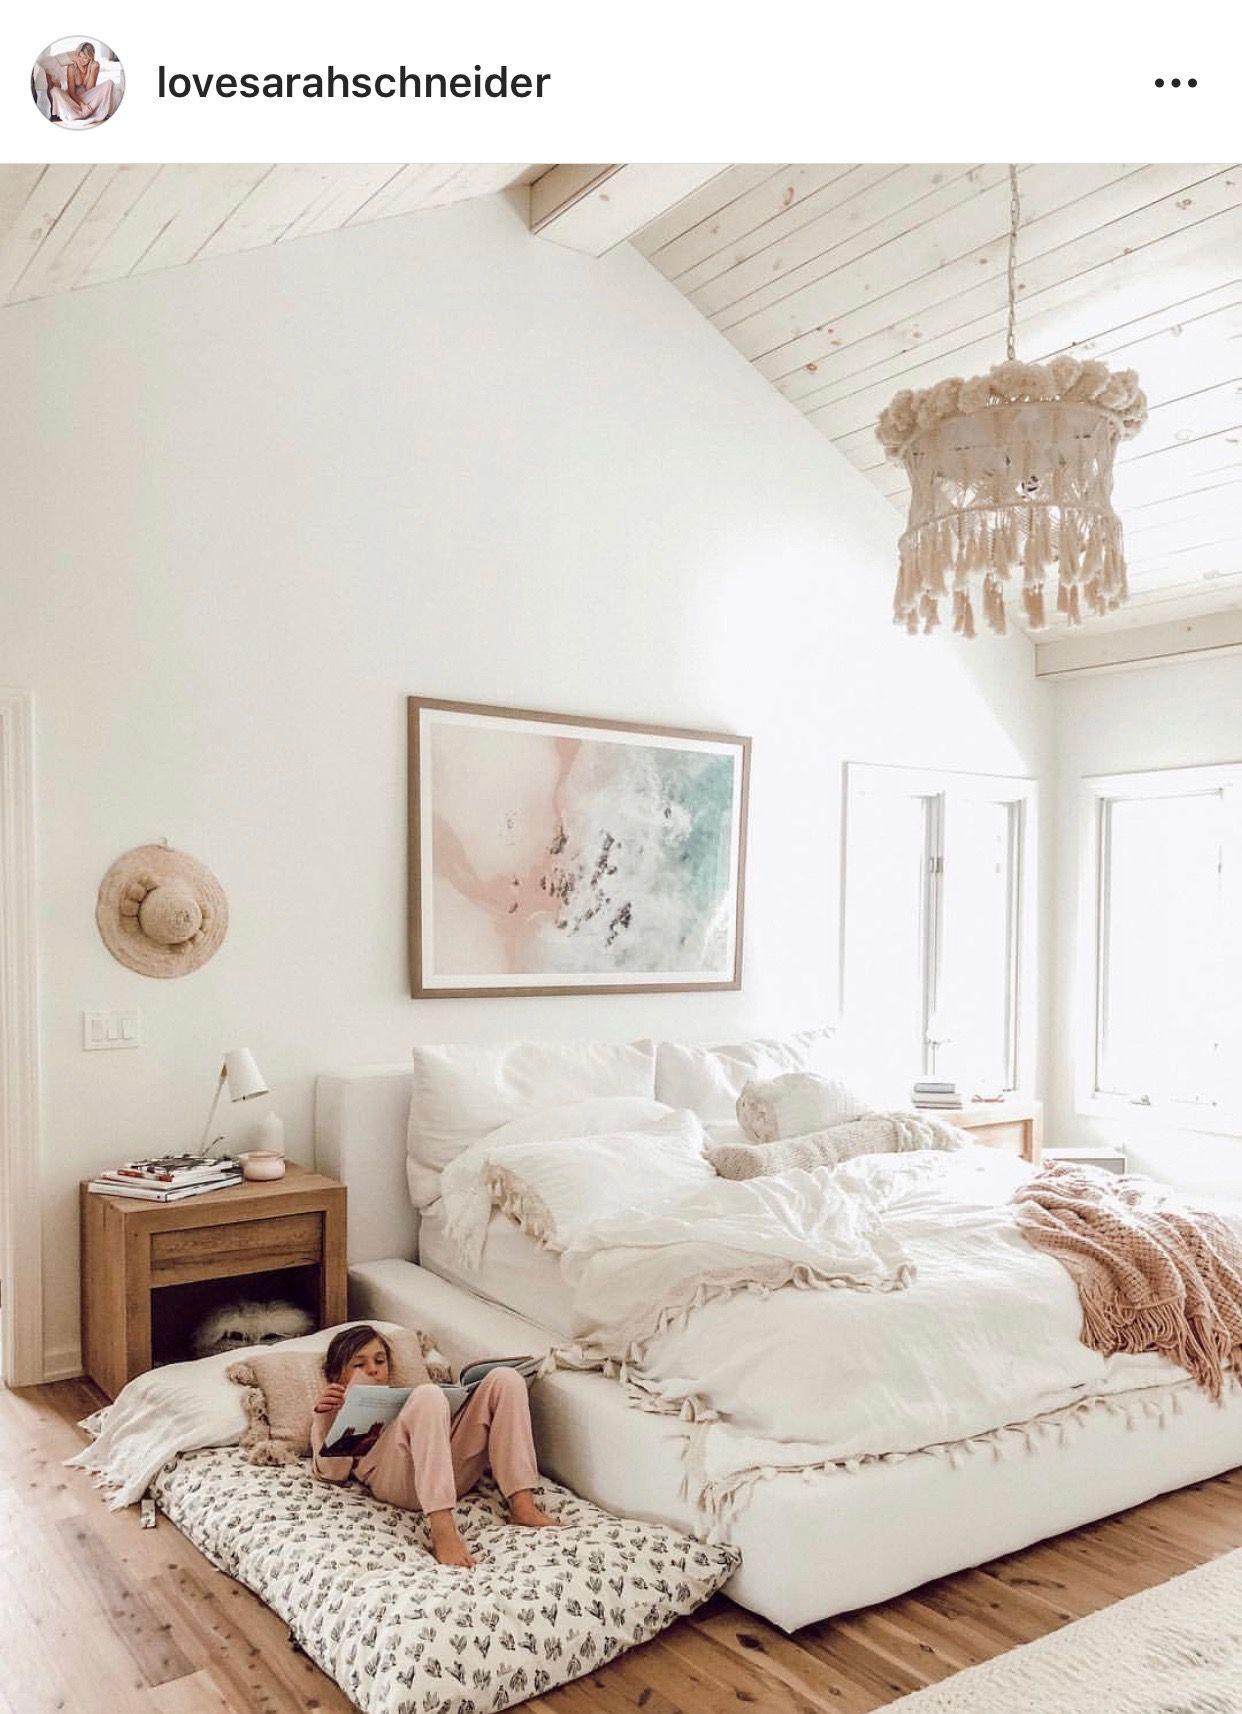 Pin By Julie Geebelen On Small Bedroom Decor Home Bedroom Design